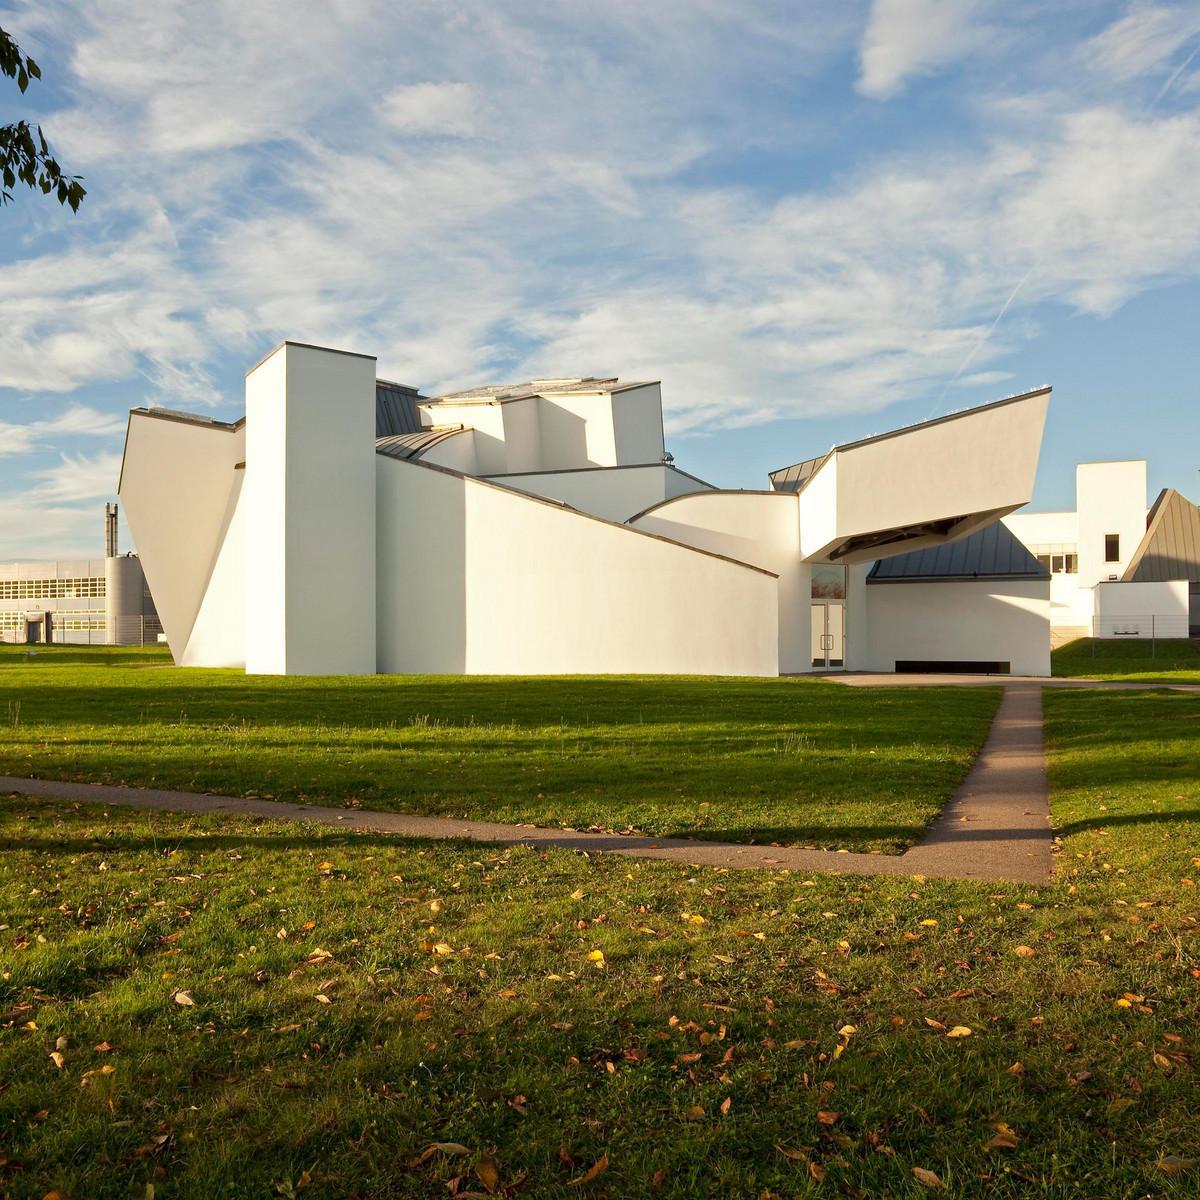 Vitra Design Museum, Frank Gehry, 1989 © Vitra Design Museum, Foto: Bettina Matthiessen